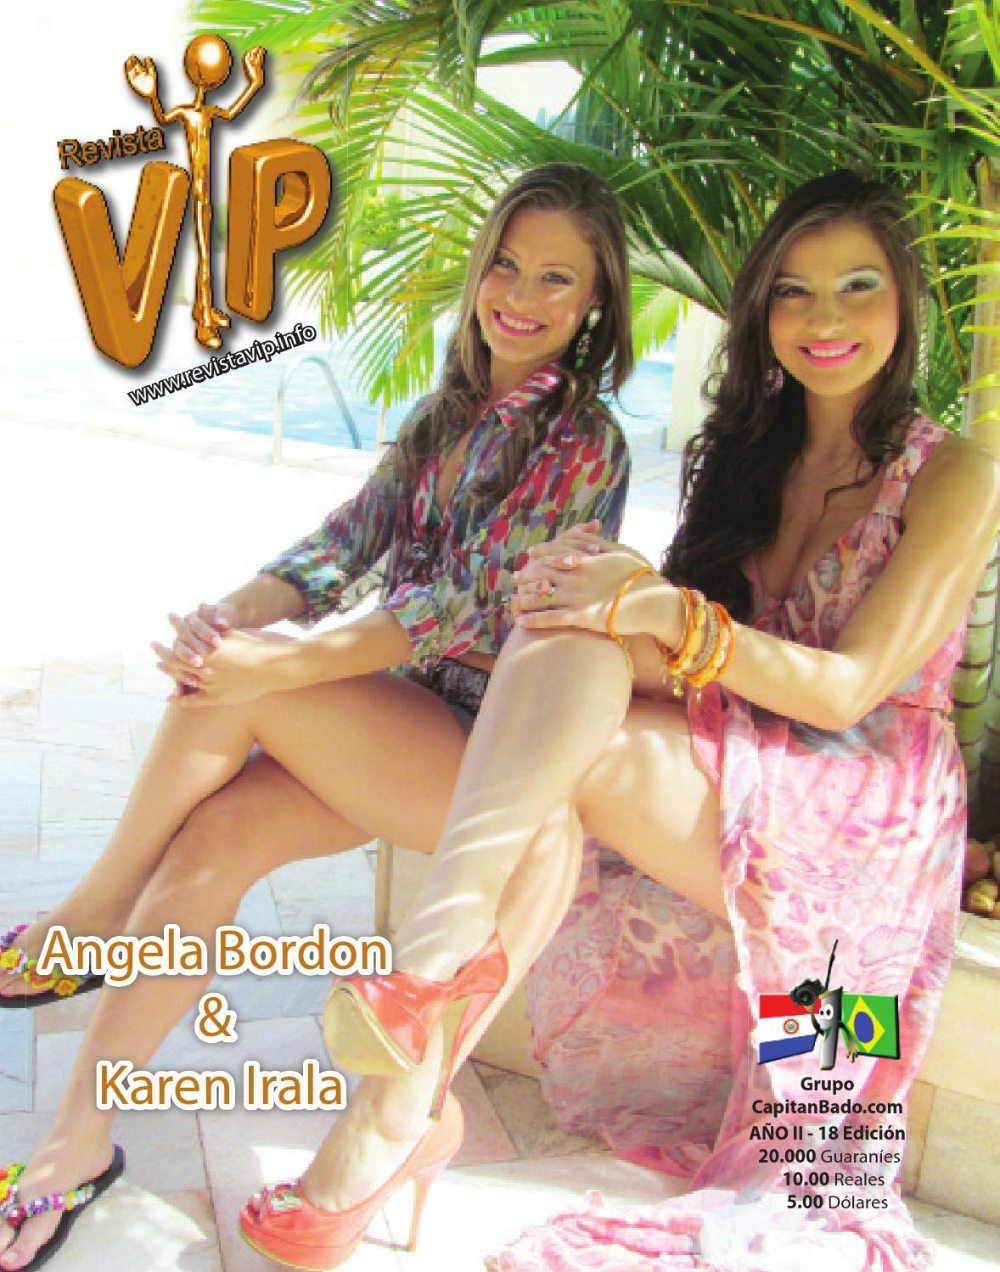 Vip 18 Paraguay